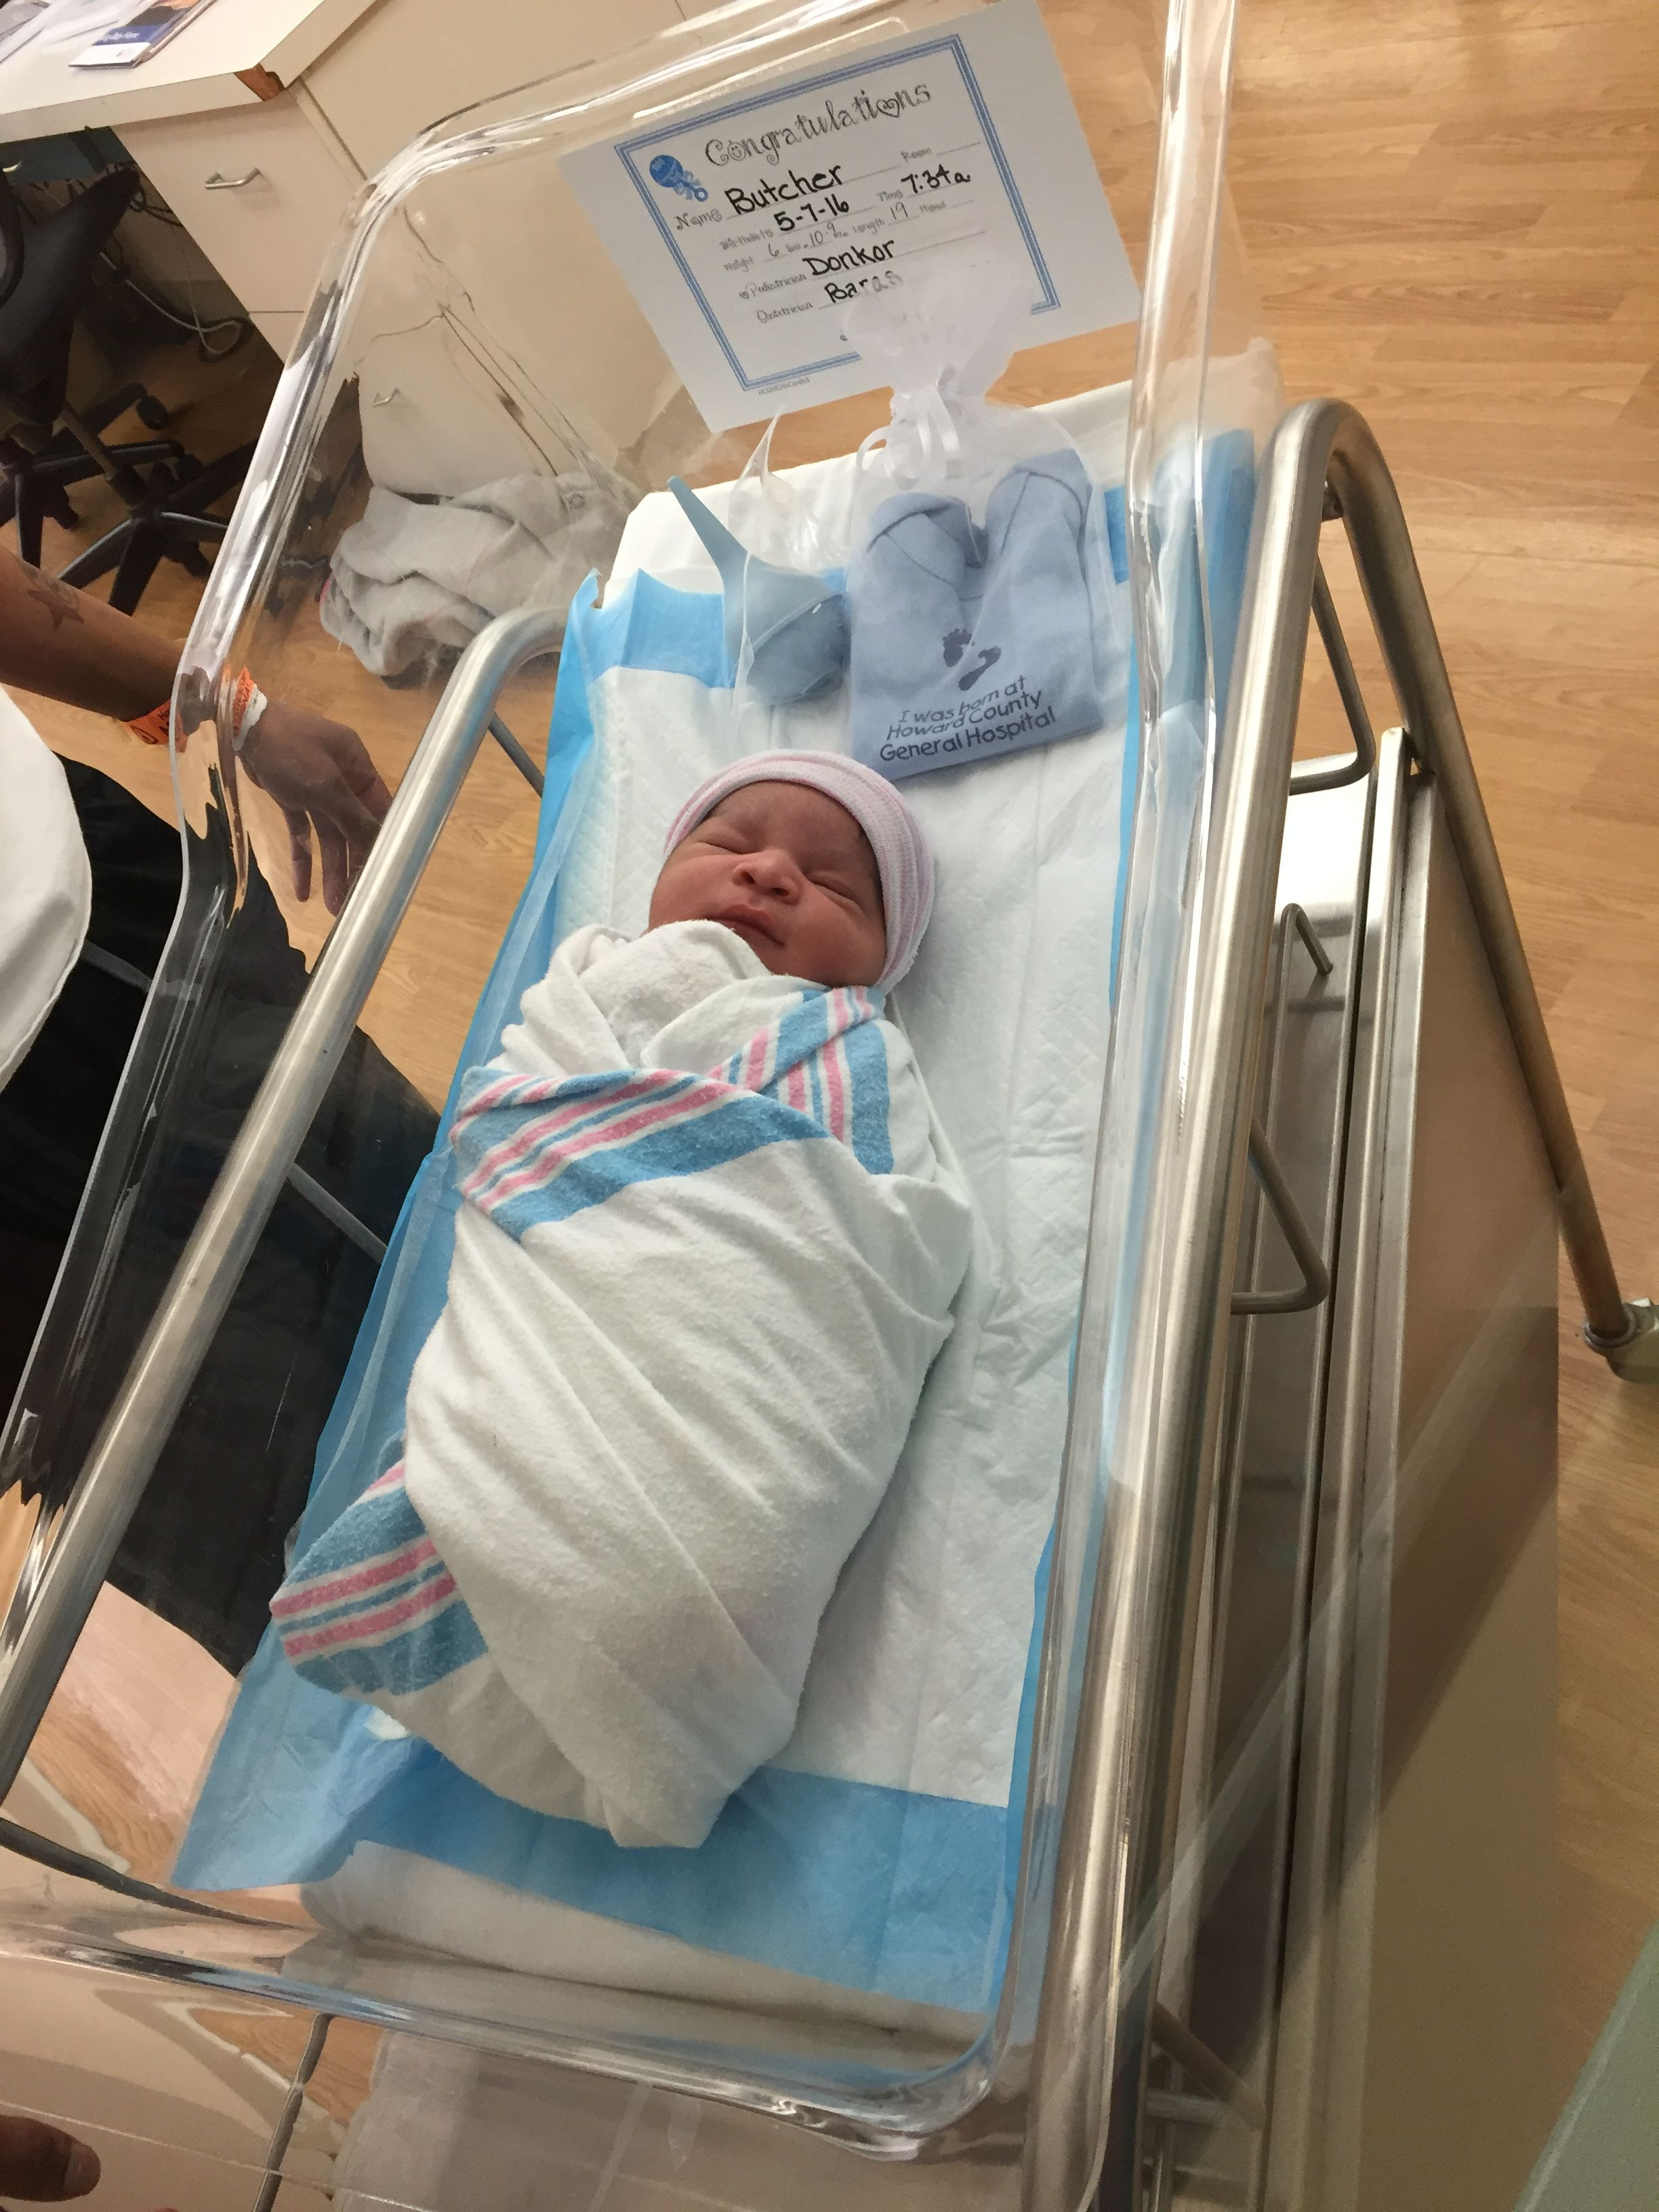 Pin By Jaide Amani On Courtney A K A Chucky Baby Boy Newborn Newborn Baby Hospital Newborn Black Babies